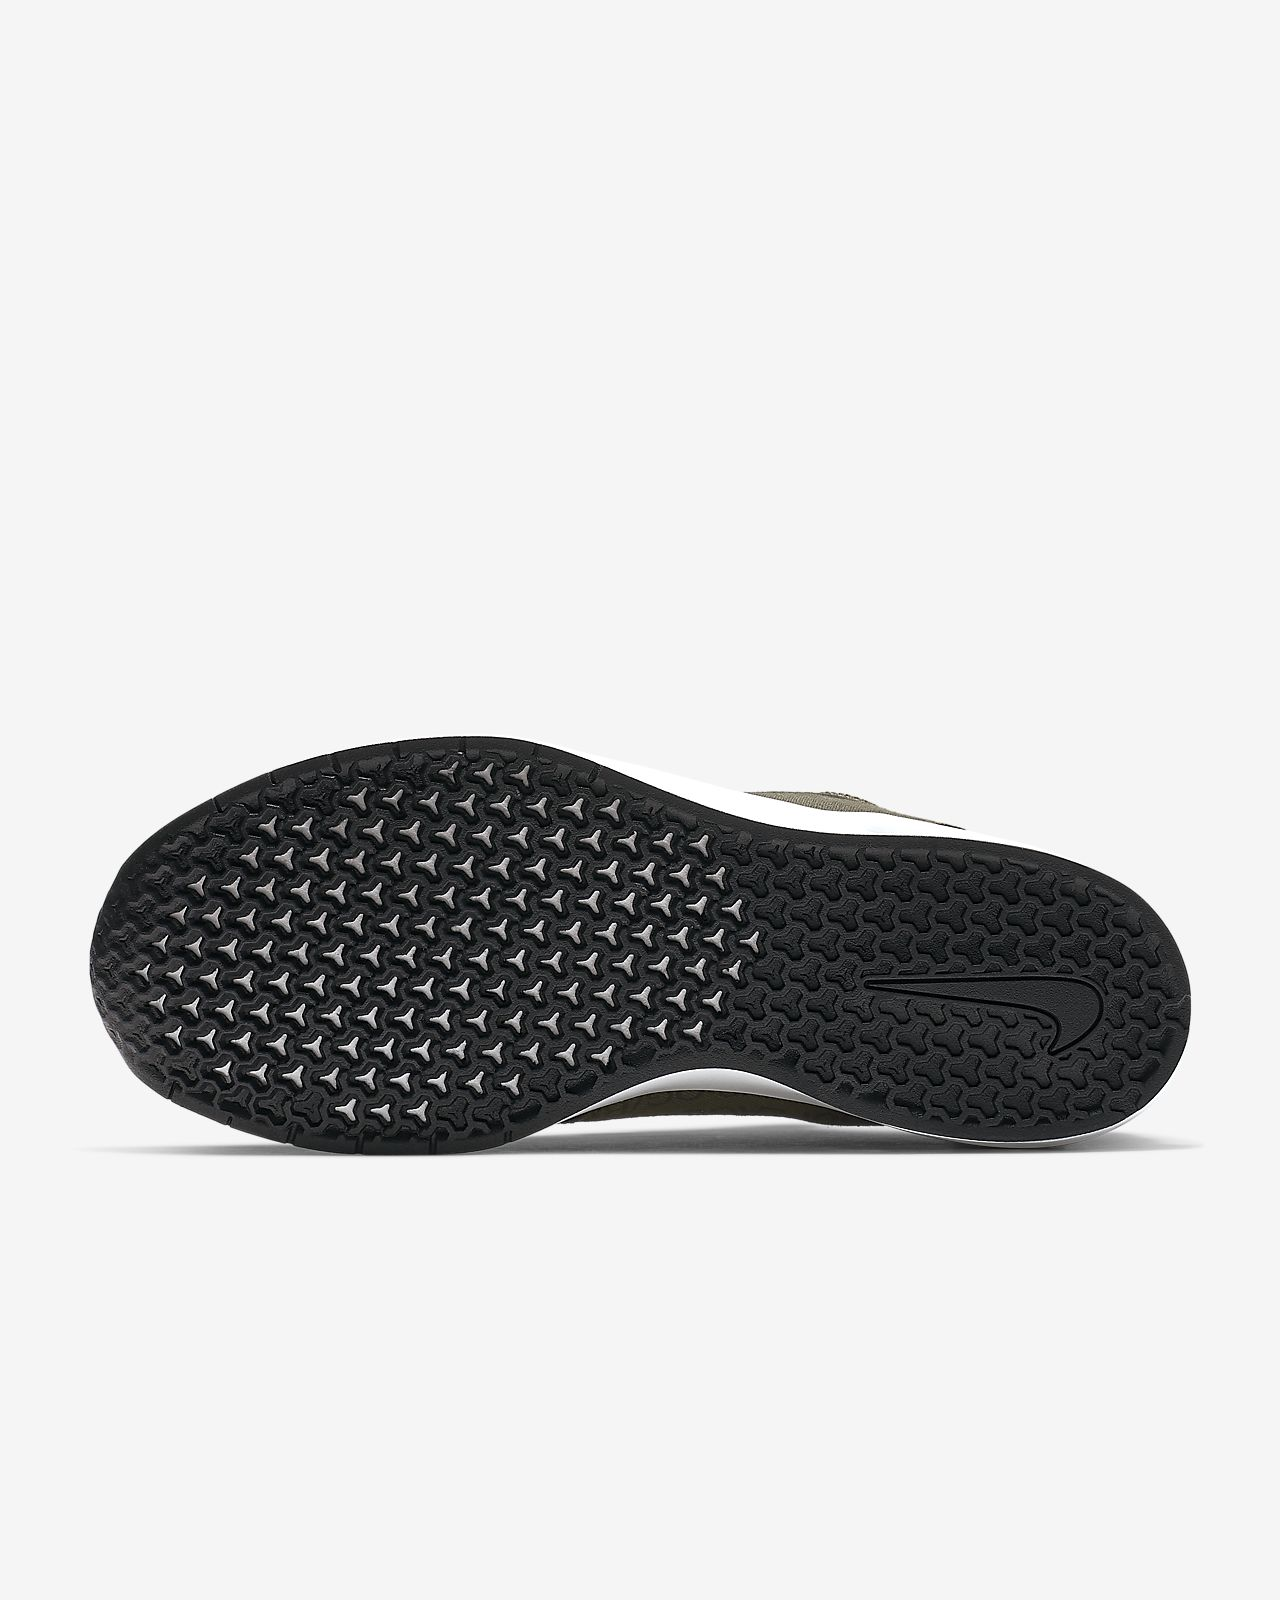 buy popular 73ce1 1fb23 ... Nike SB Air Max Janoski 2 Premium Men s Skate Shoe